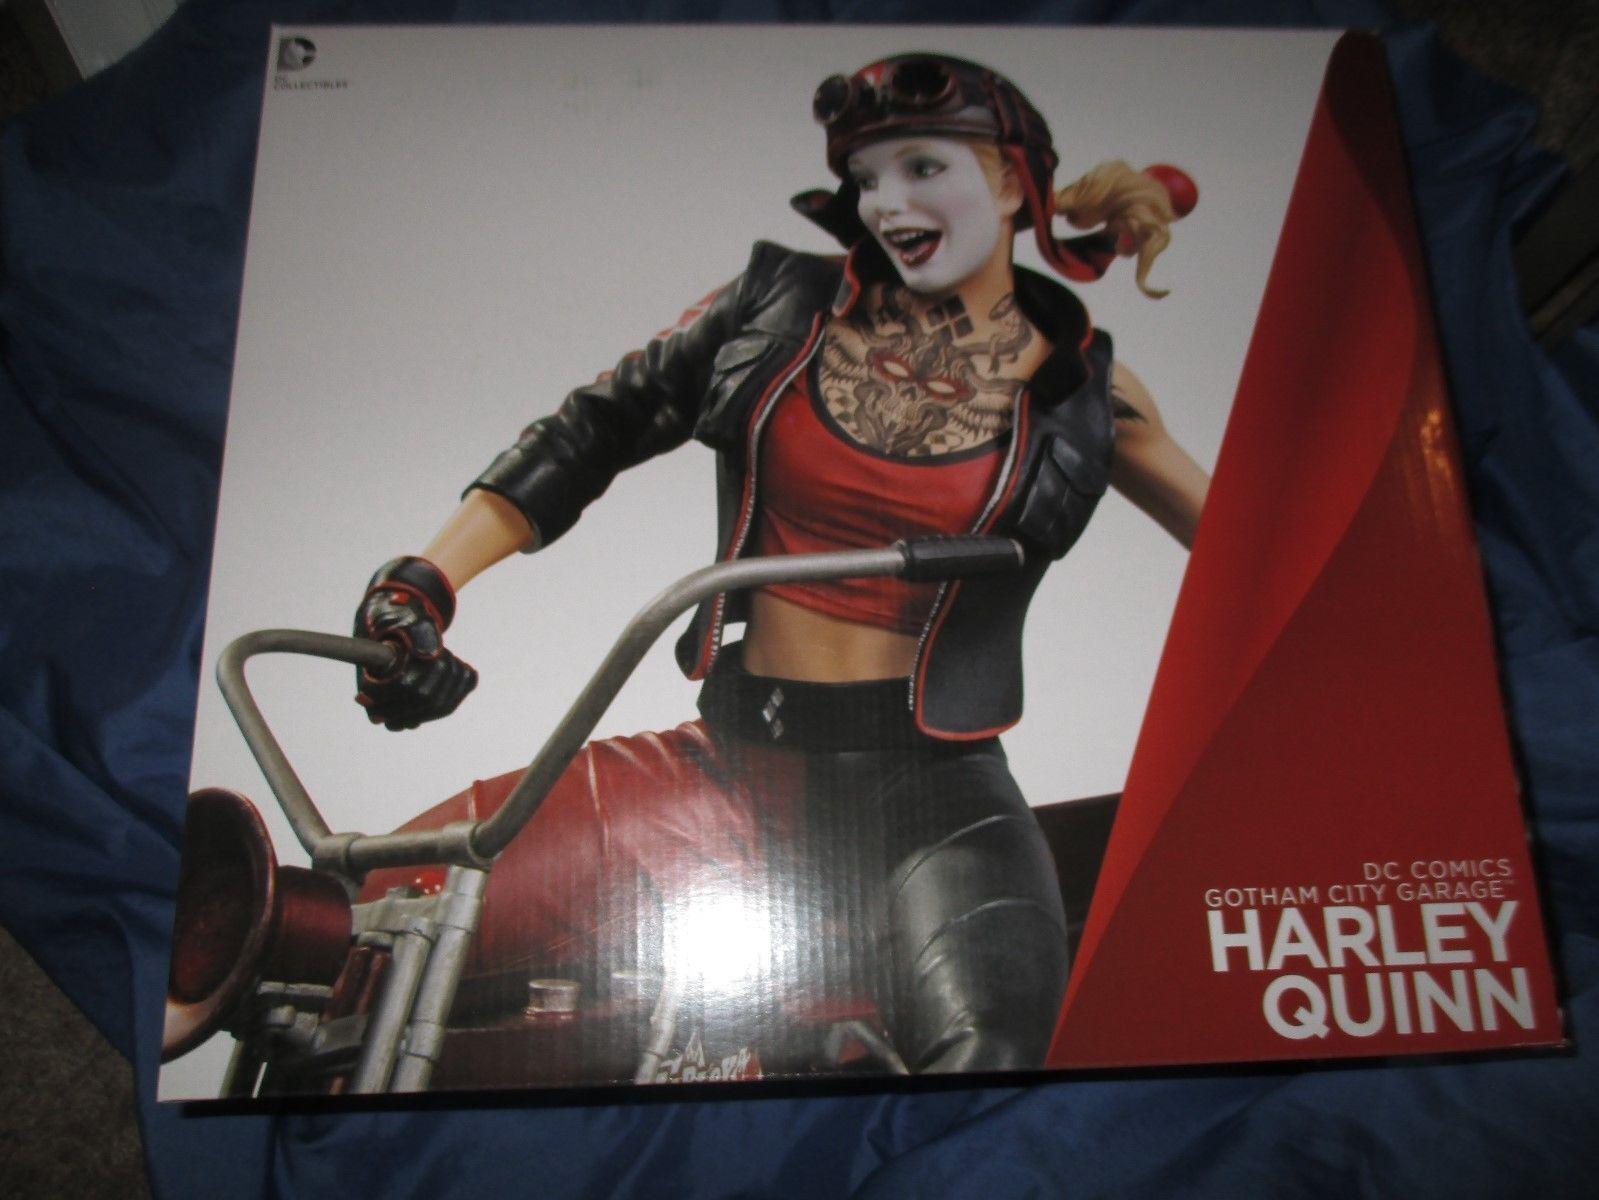 Gotham City Garage Harley Quinn Statue - - - UK Seller a40c2d